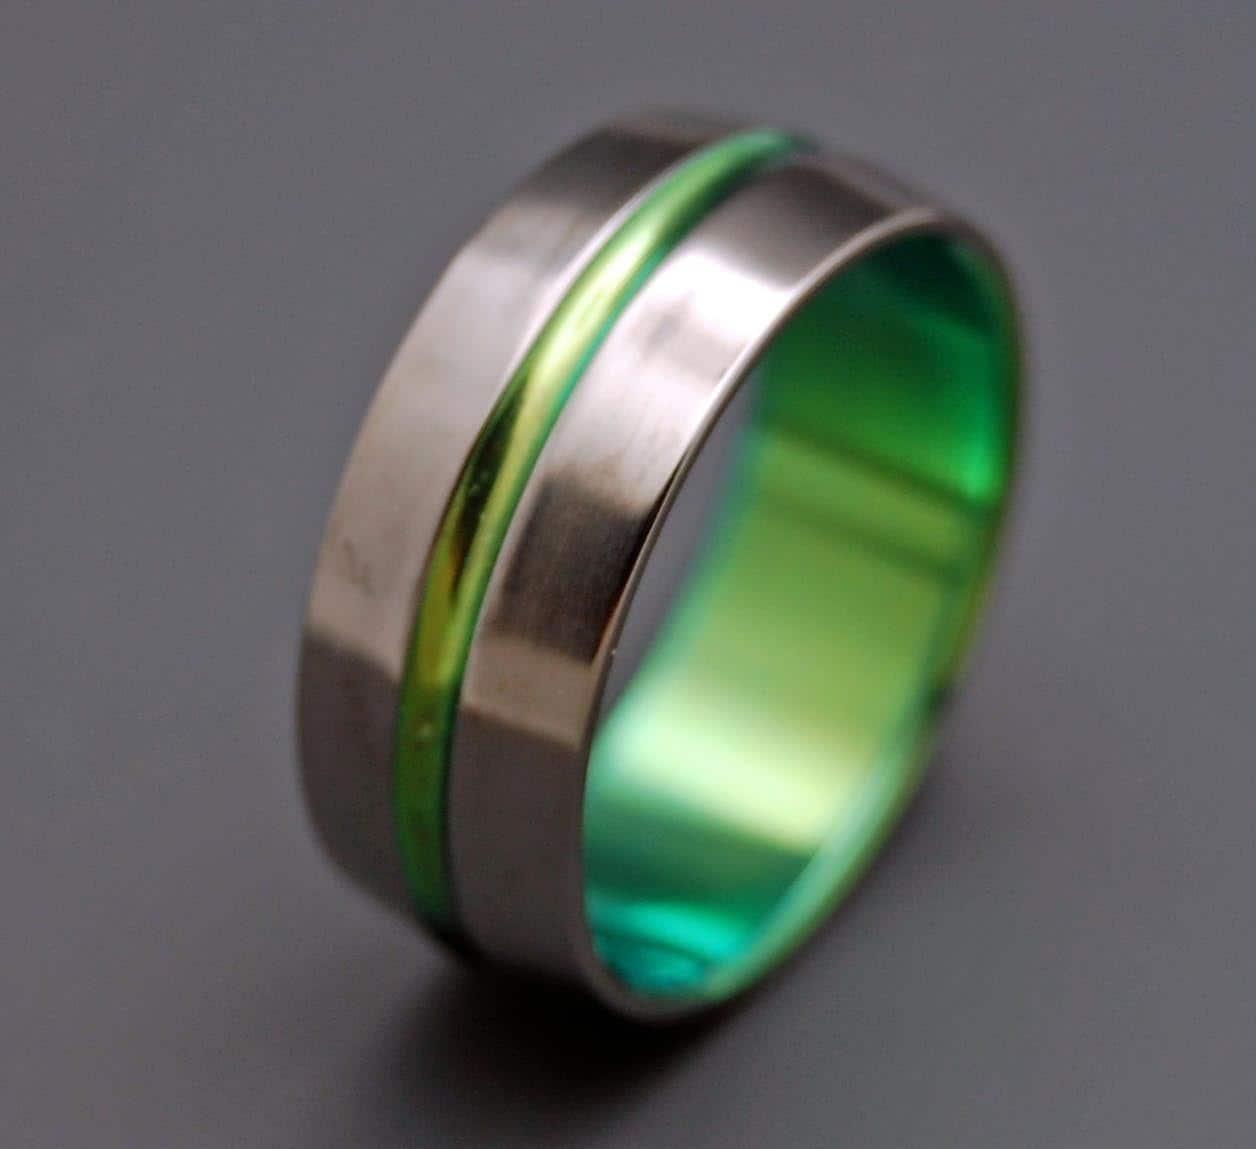 mens titanium ring mens titanium wedding rings Titanium wedding ring wedding ring titaniun rings mens ring womens rings eco friendly INSPIRED BY GREEN